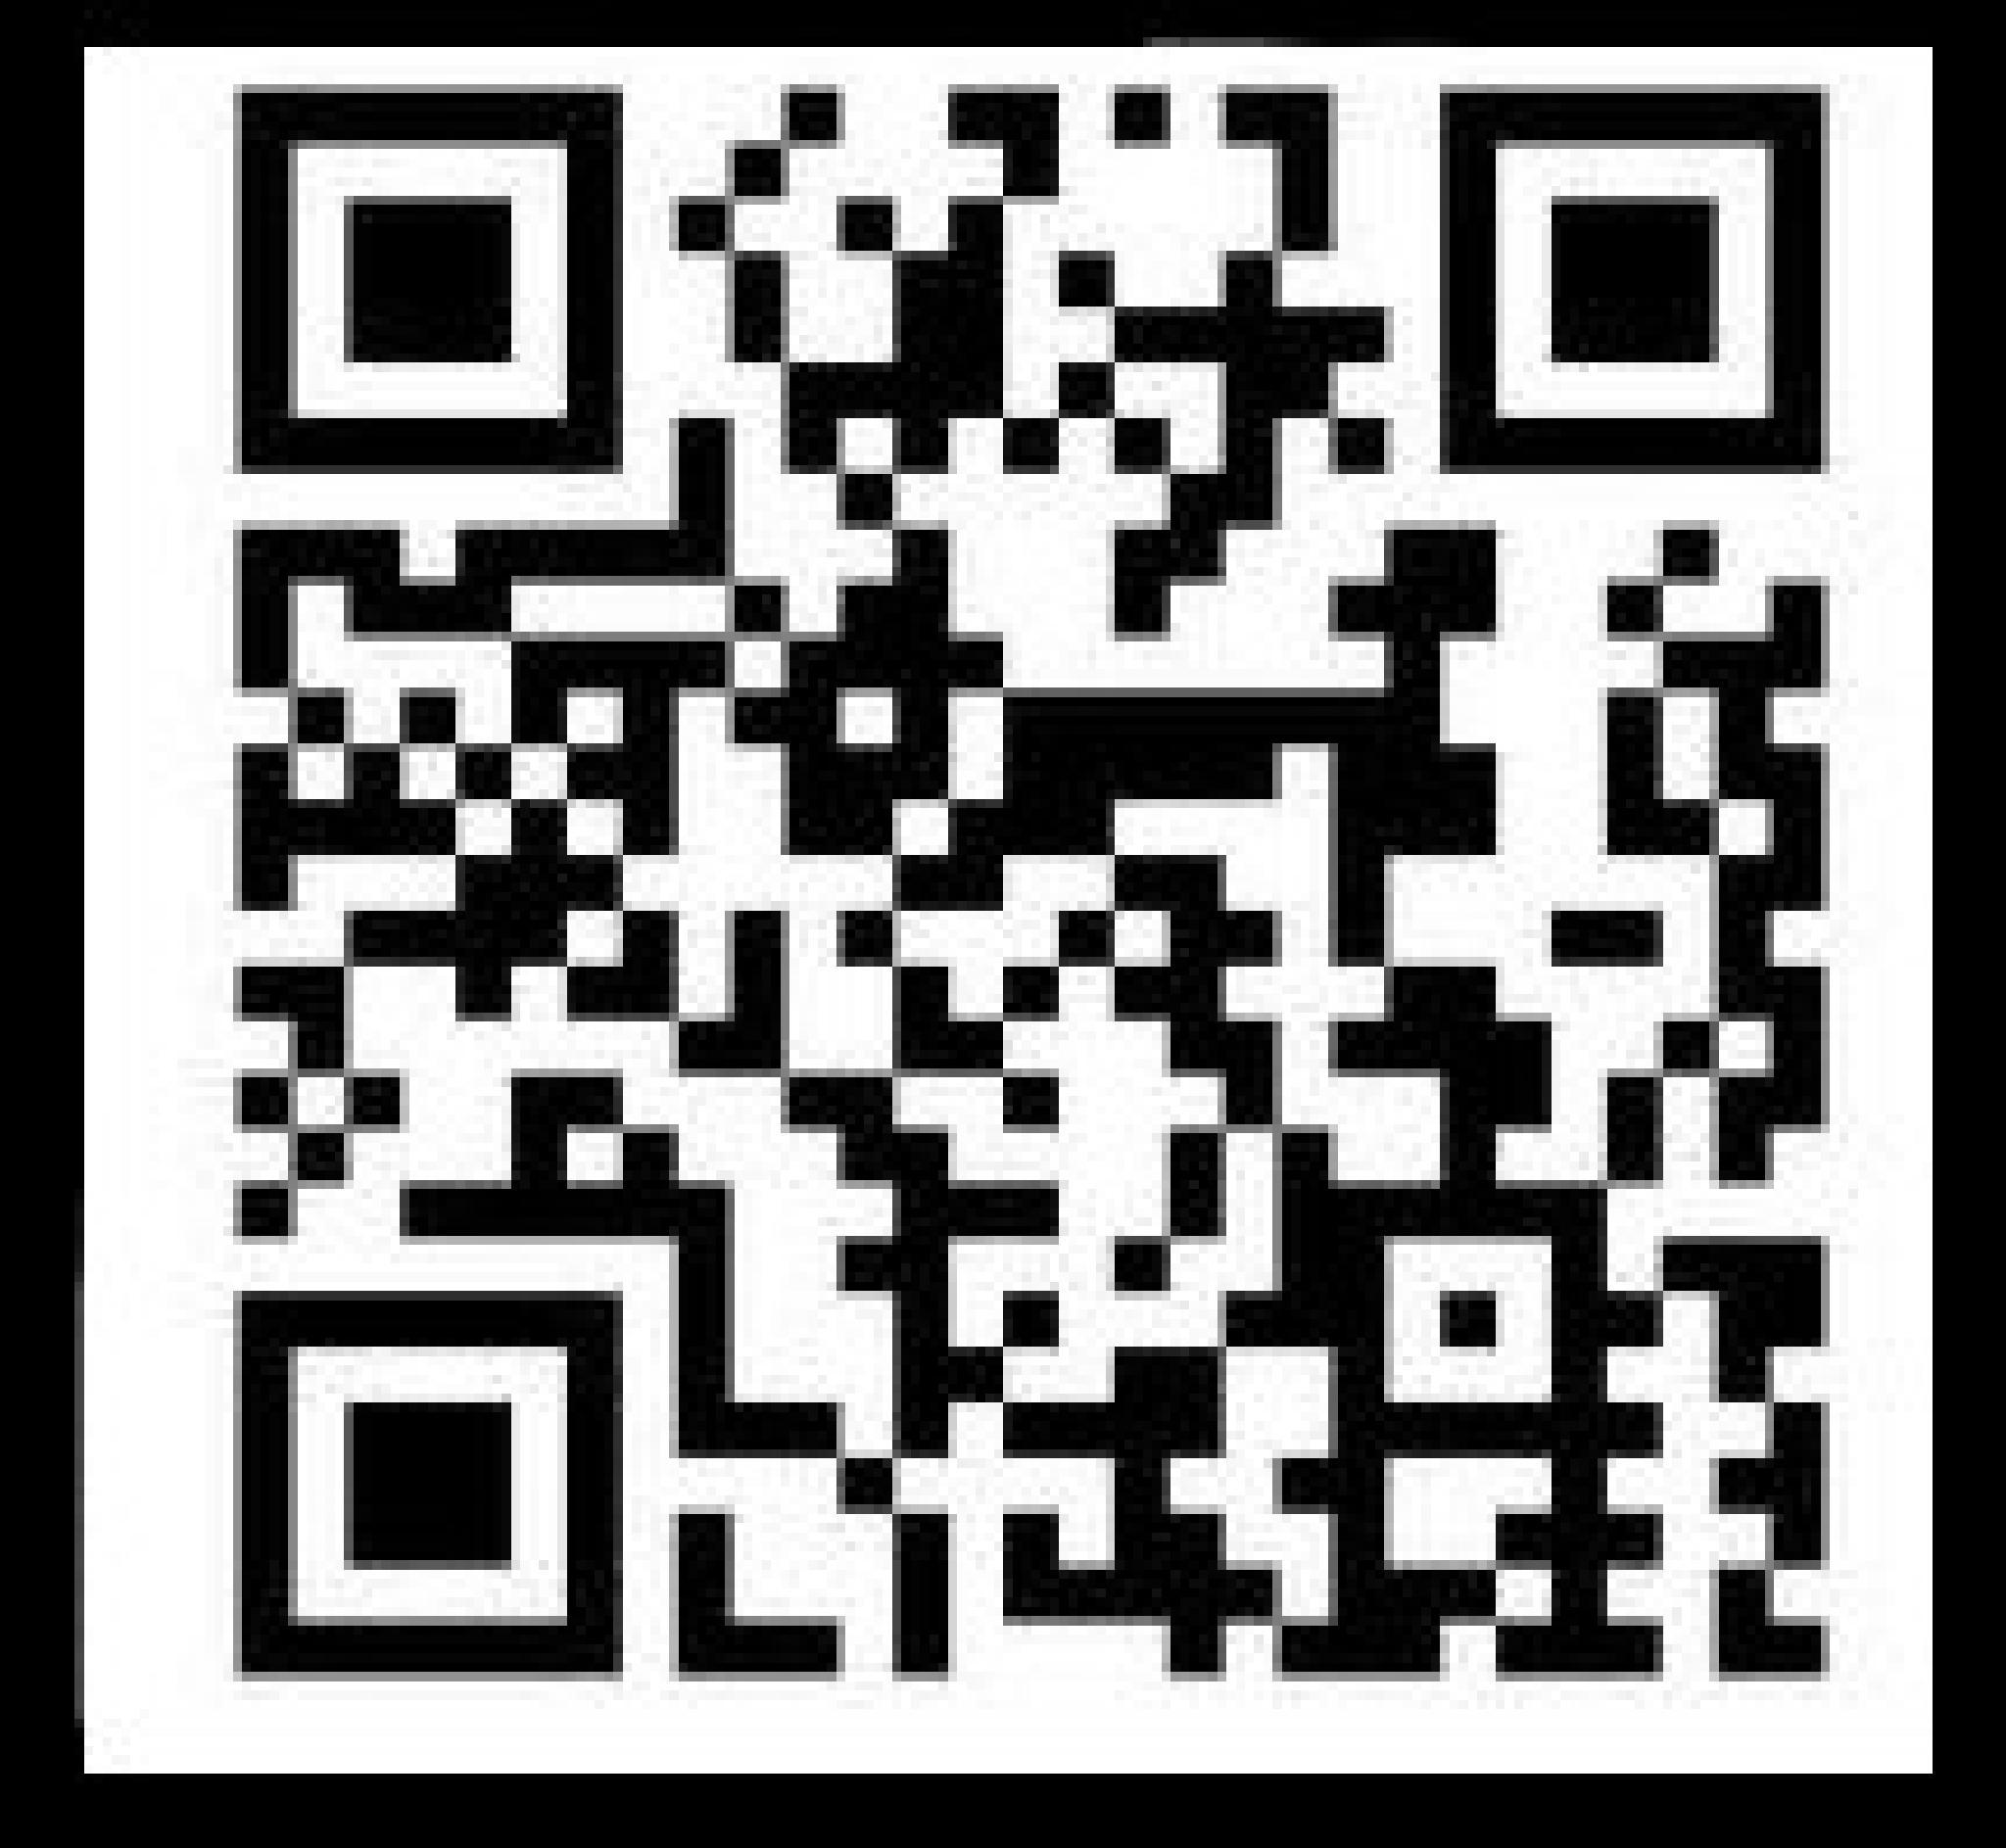 QR code by Mario photo